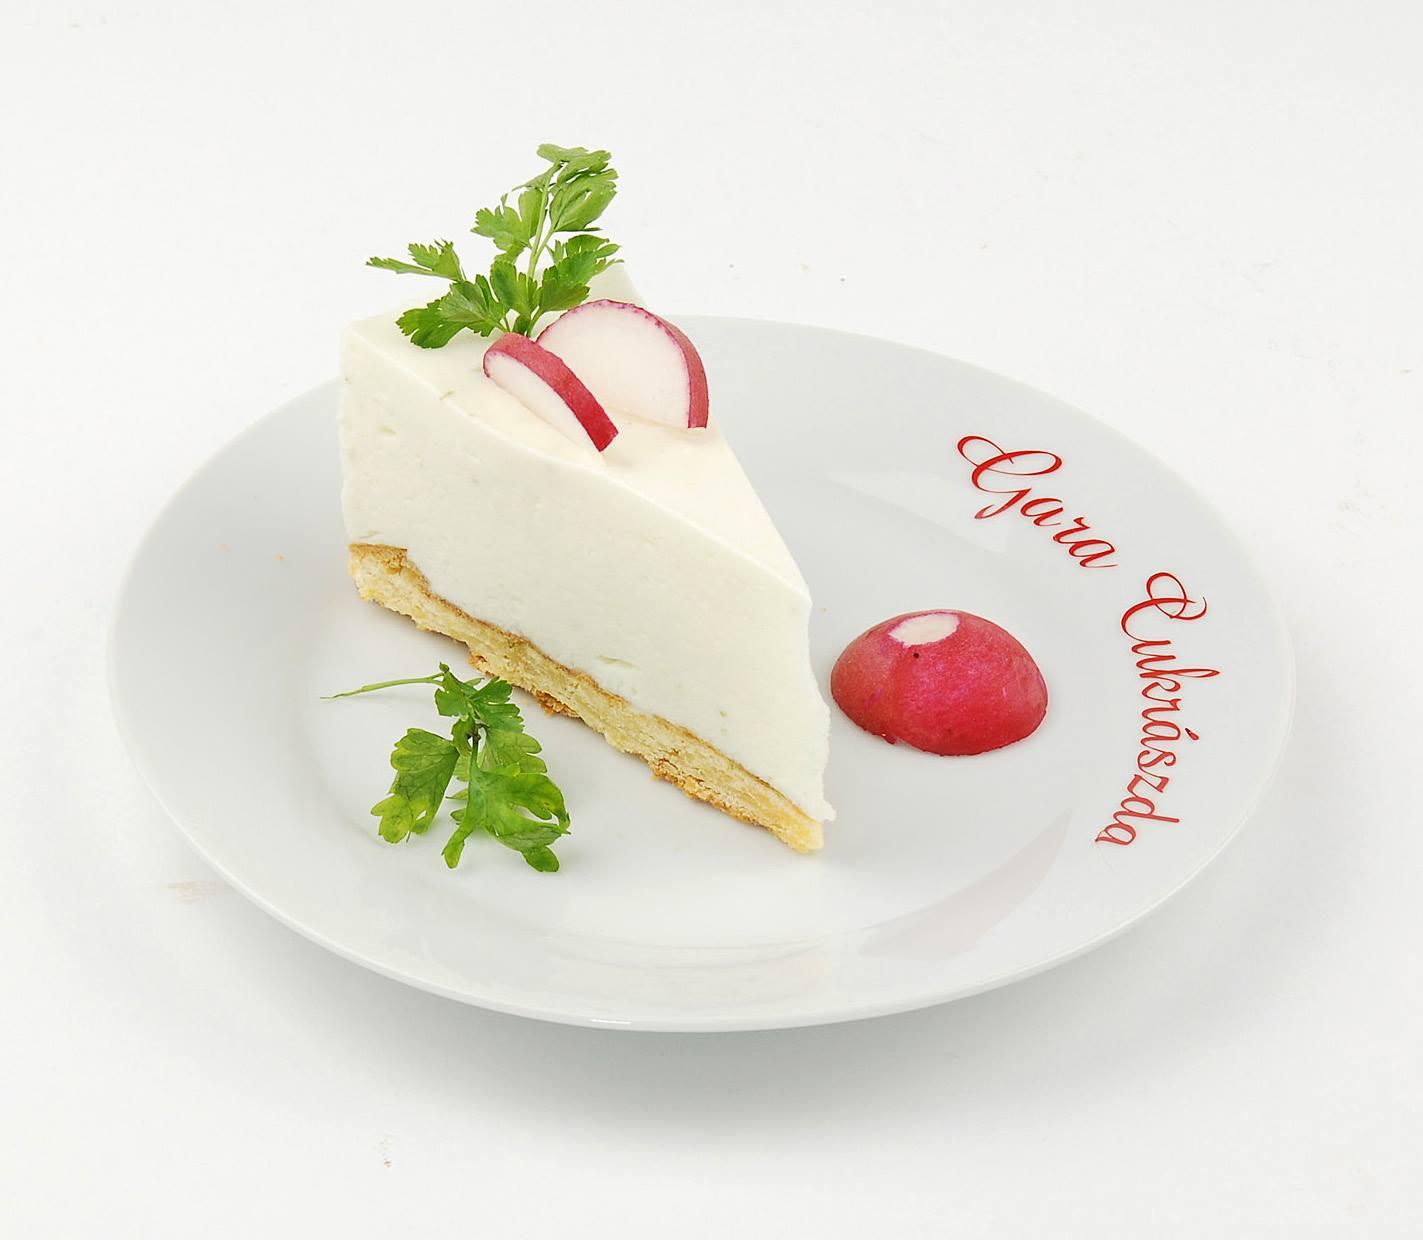 Zöldfűszeres sajt torta